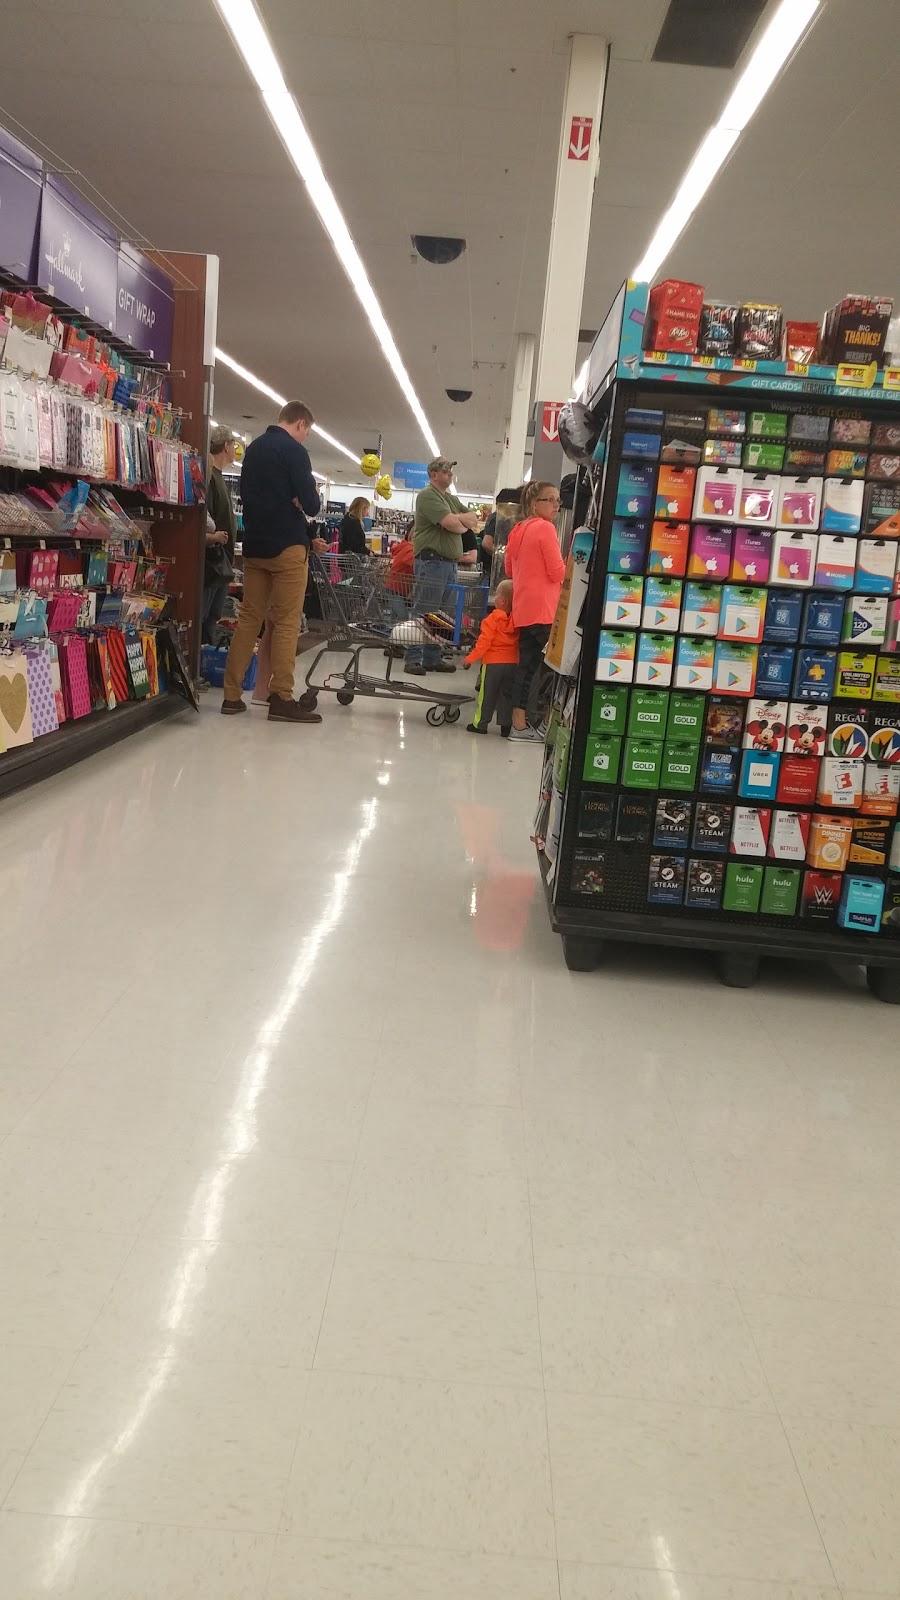 Walmart Supercenter - department store  | Photo 8 of 10 | Address: 1169 S Main St, Mansfield, PA 16933, USA | Phone: (570) 662-1115